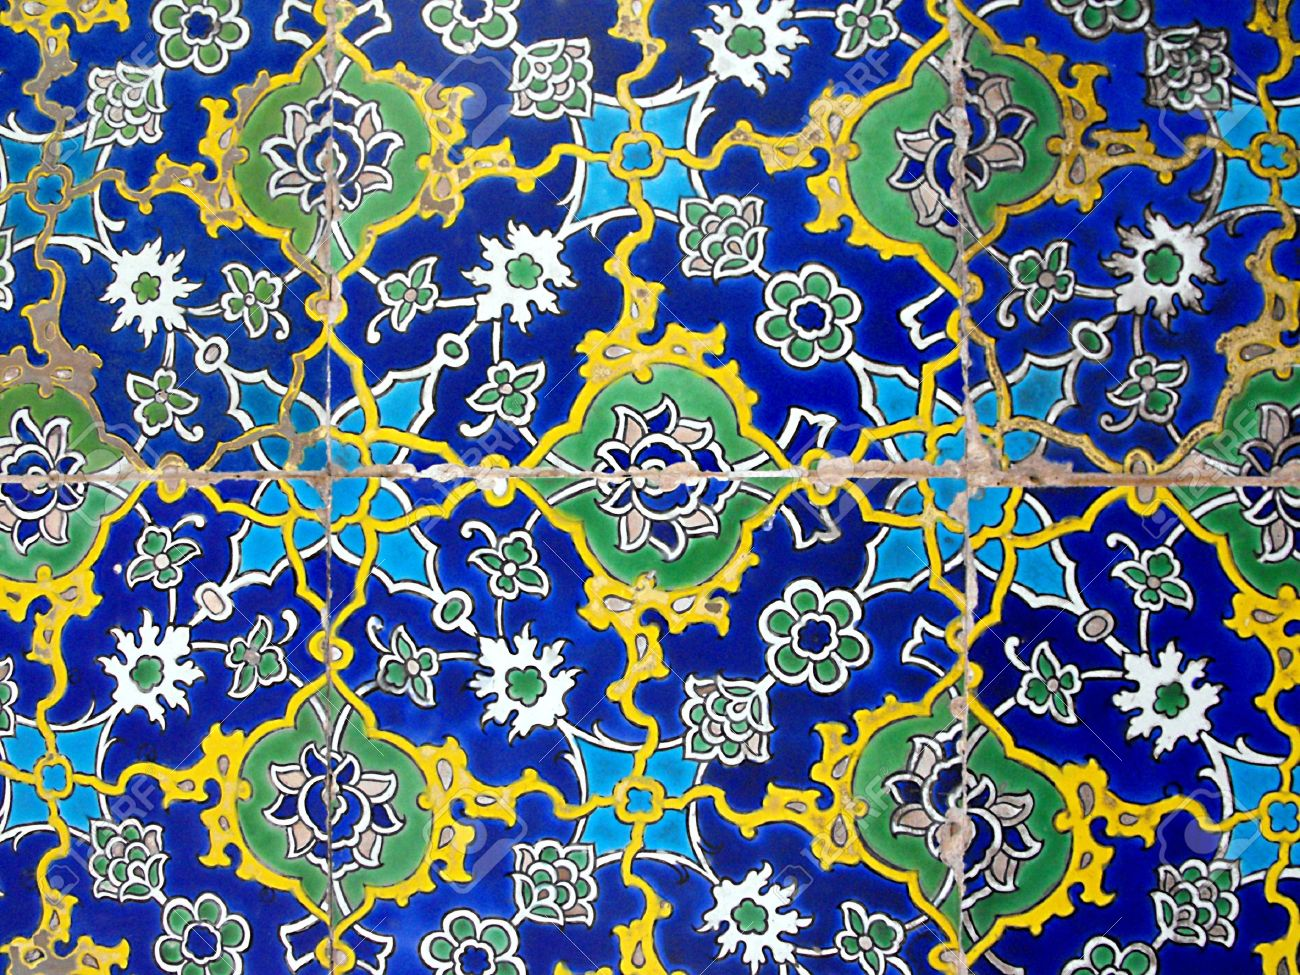 Magnificent 1 Inch Hexagon Floor Tiles Tiny 12X12 Floor Tiles Shaped 12X24 Ceramic Tile Patterns 2 X 12 Ceramic Tile Young 2X6 Subway Tile Dark3D Ceiling Tiles Antique Ceramic Tiles In The Topkapi Palace, Istanbul, Turkey Stock ..